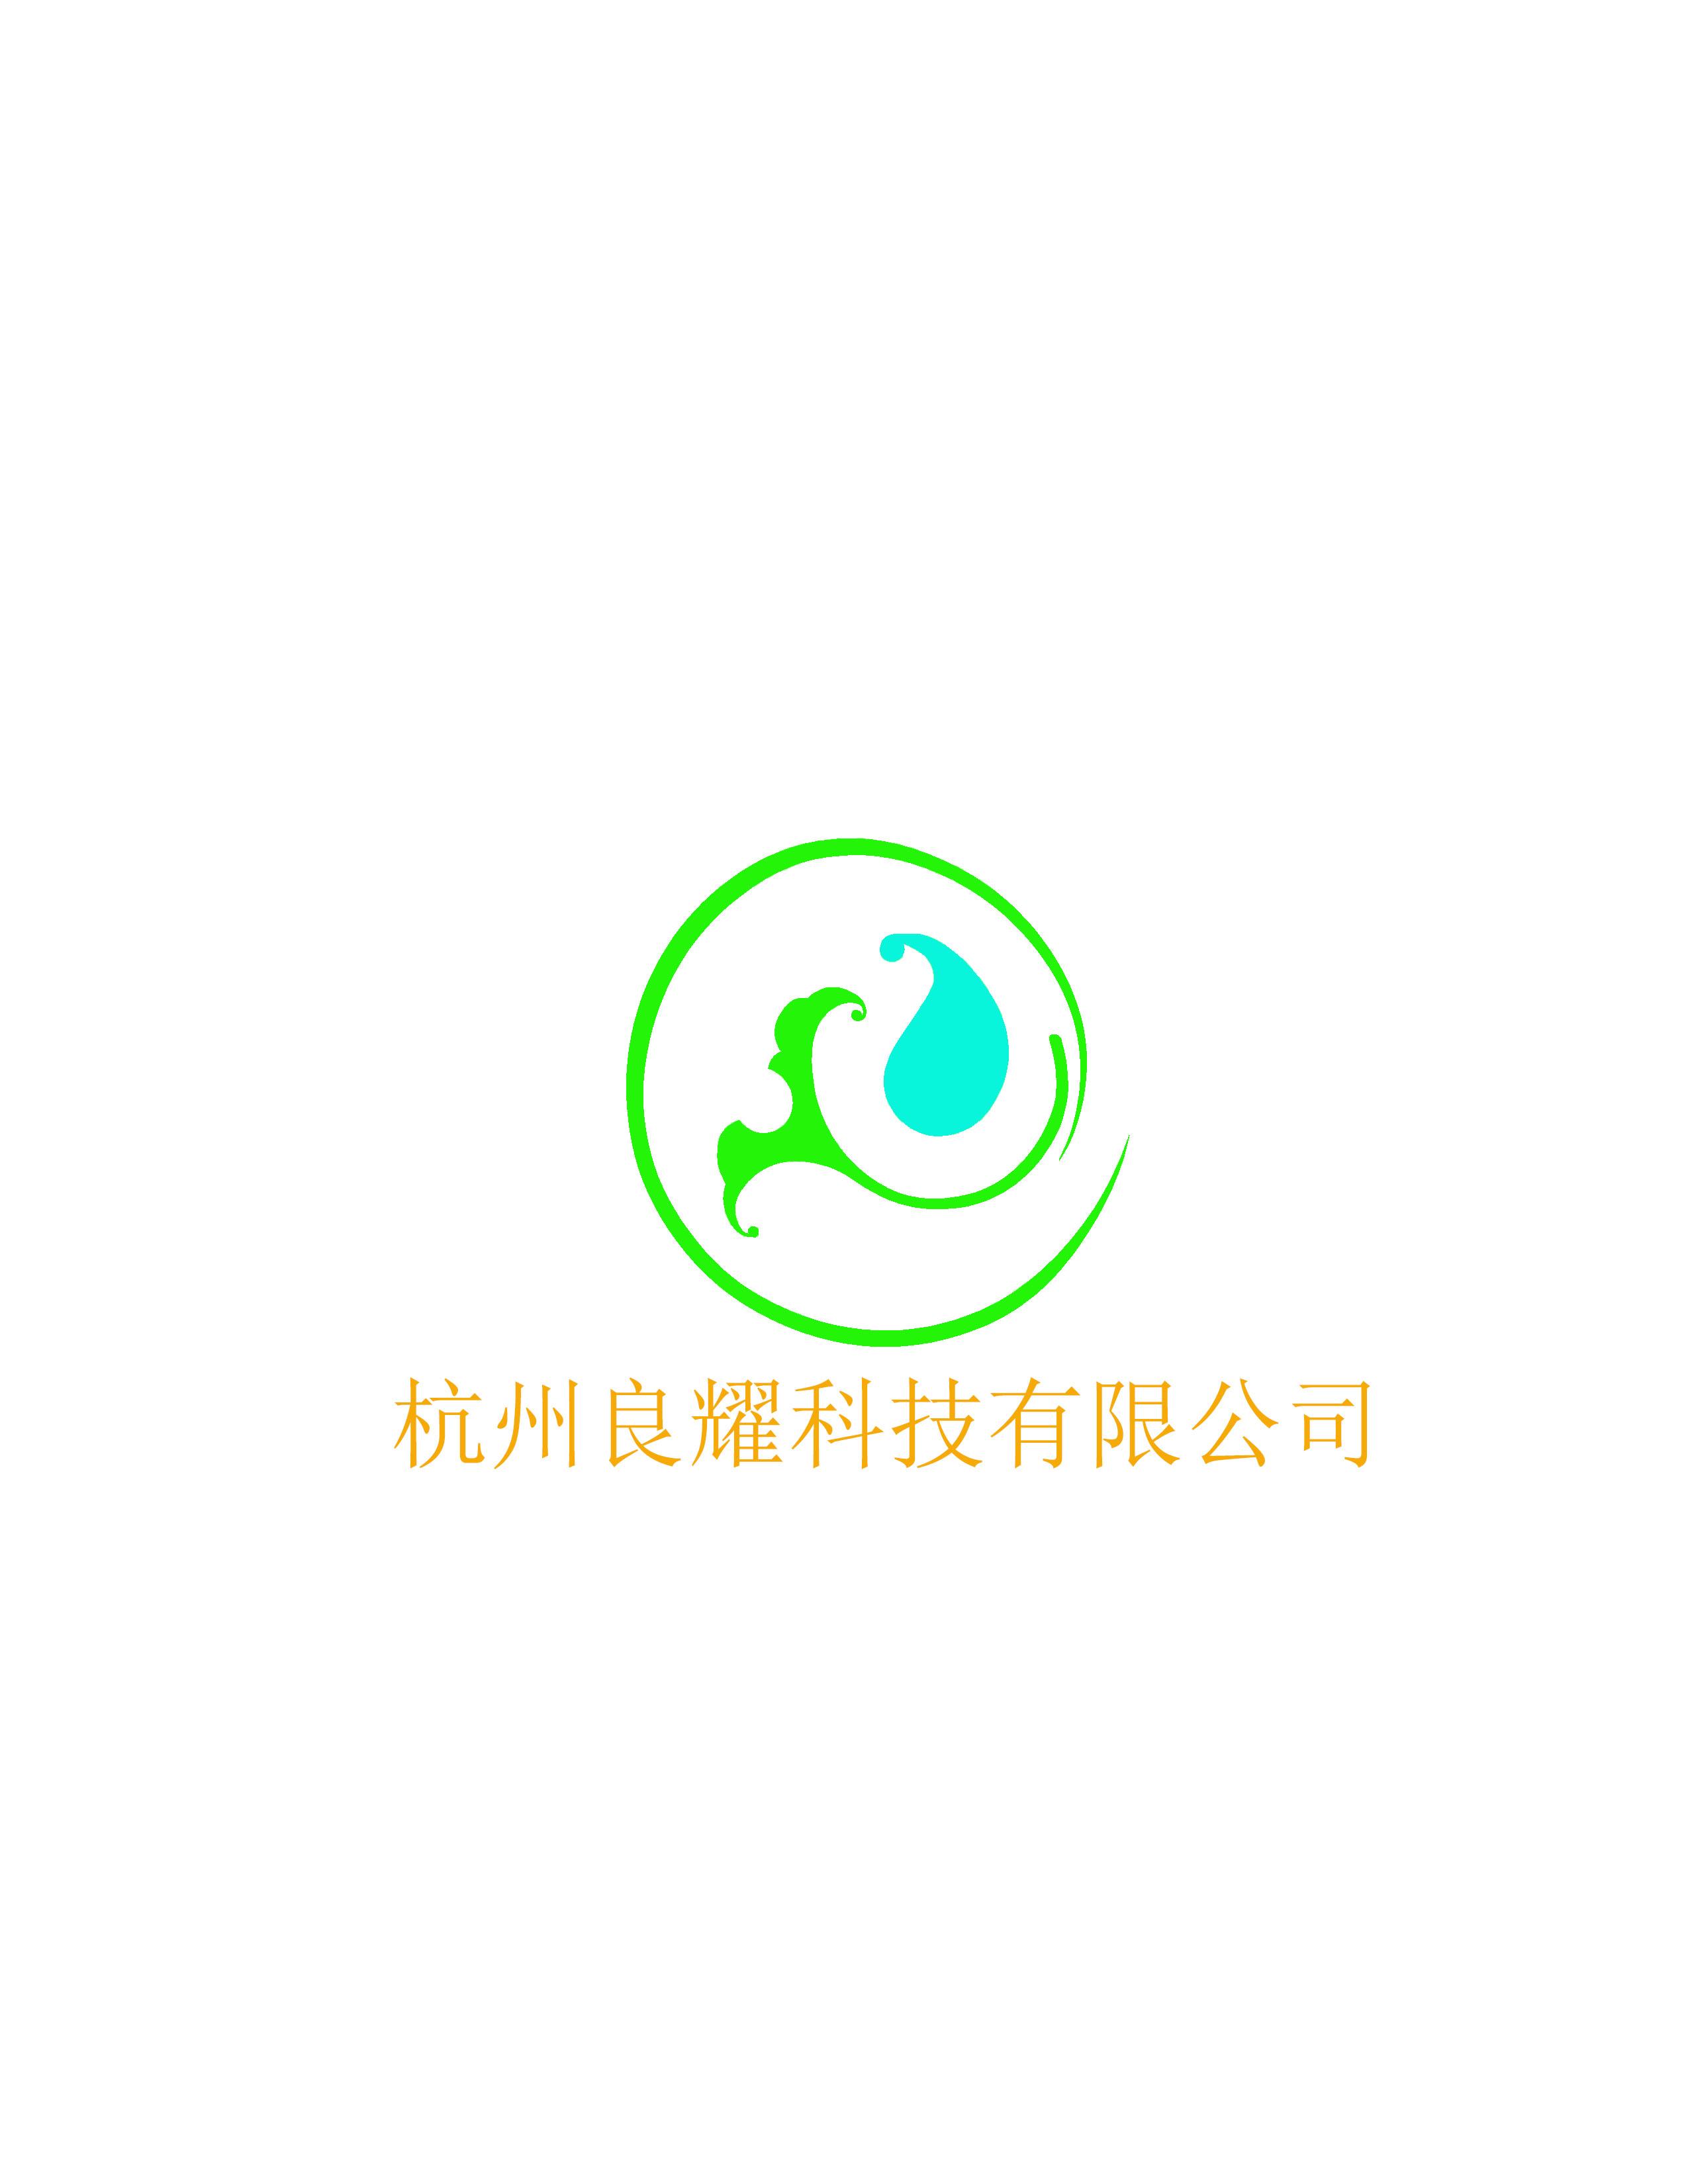 logo设计----杭州良耀科技有限公司